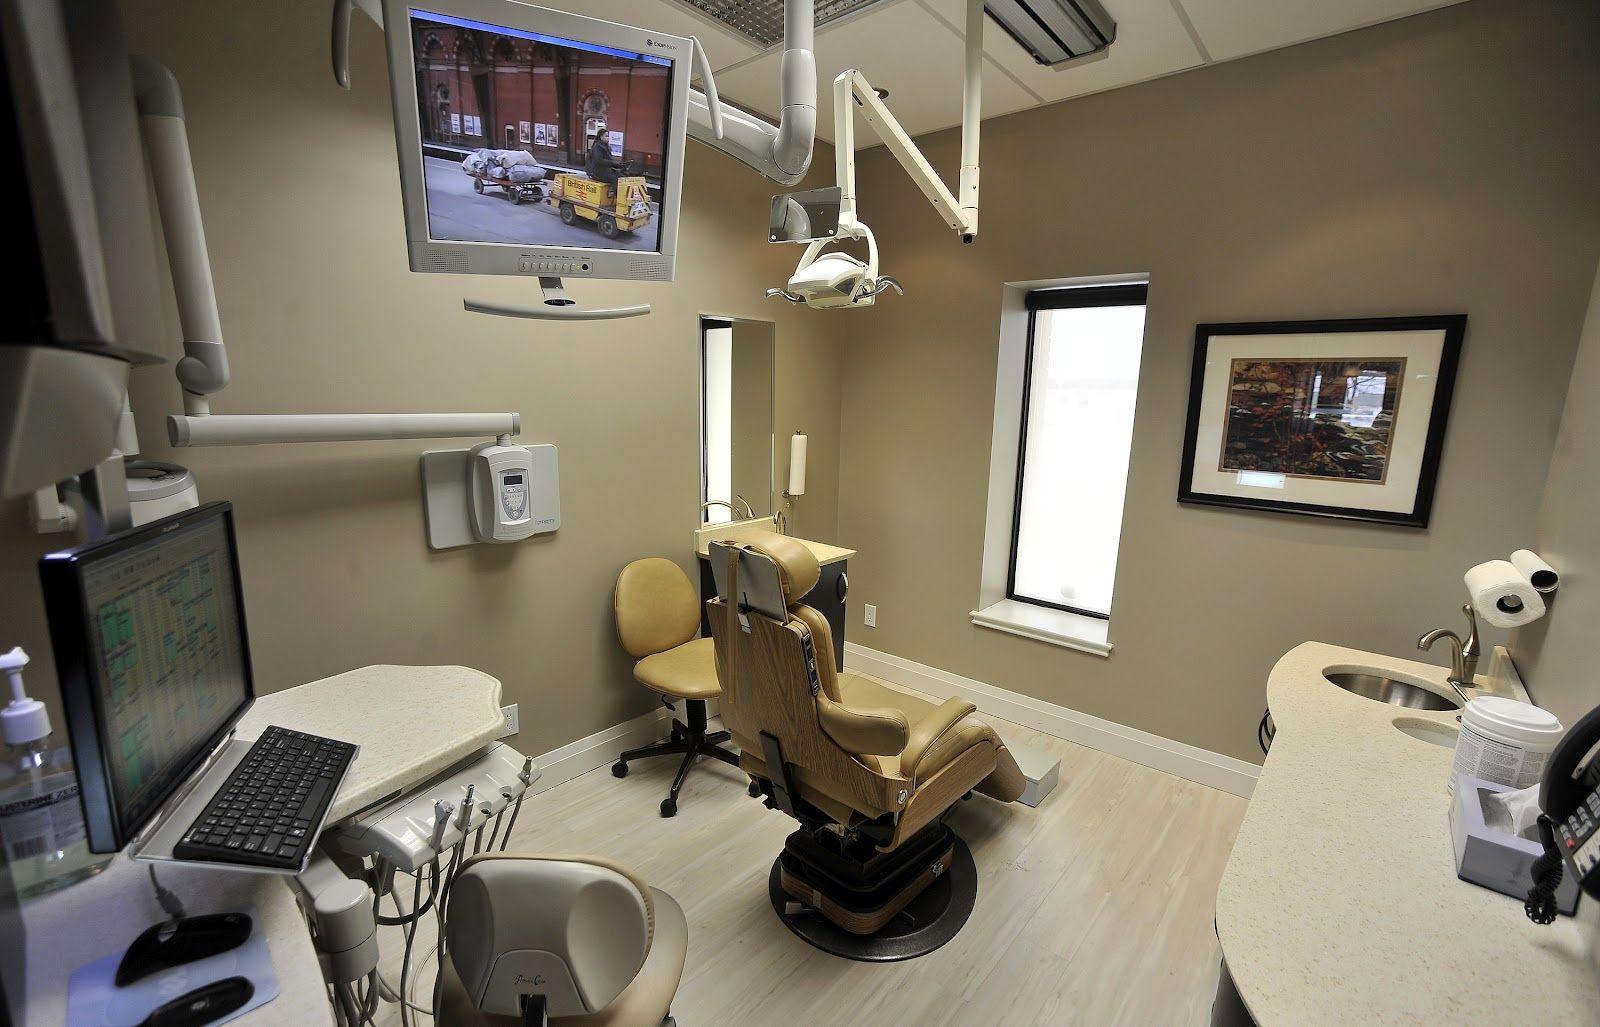 Beau CATHERINE STAPLES INTERIORS: Bayshore Dental Office Renovation